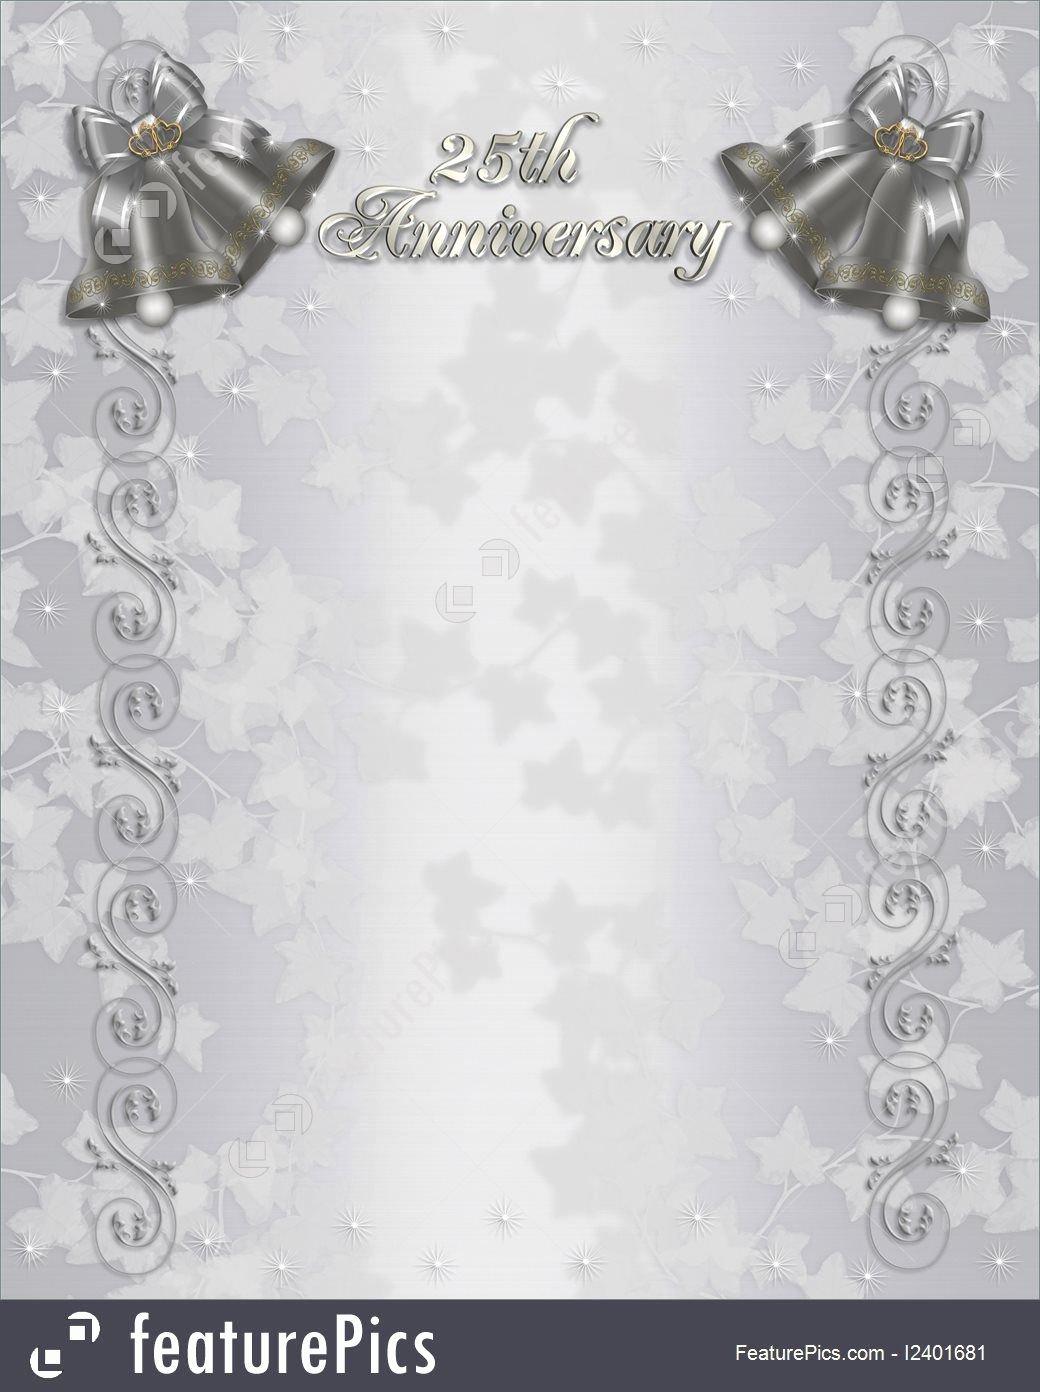 Wedding Anniversary Invitation Templates Inspirational Free 25th Wedding Anniversary Invitations Free Templates